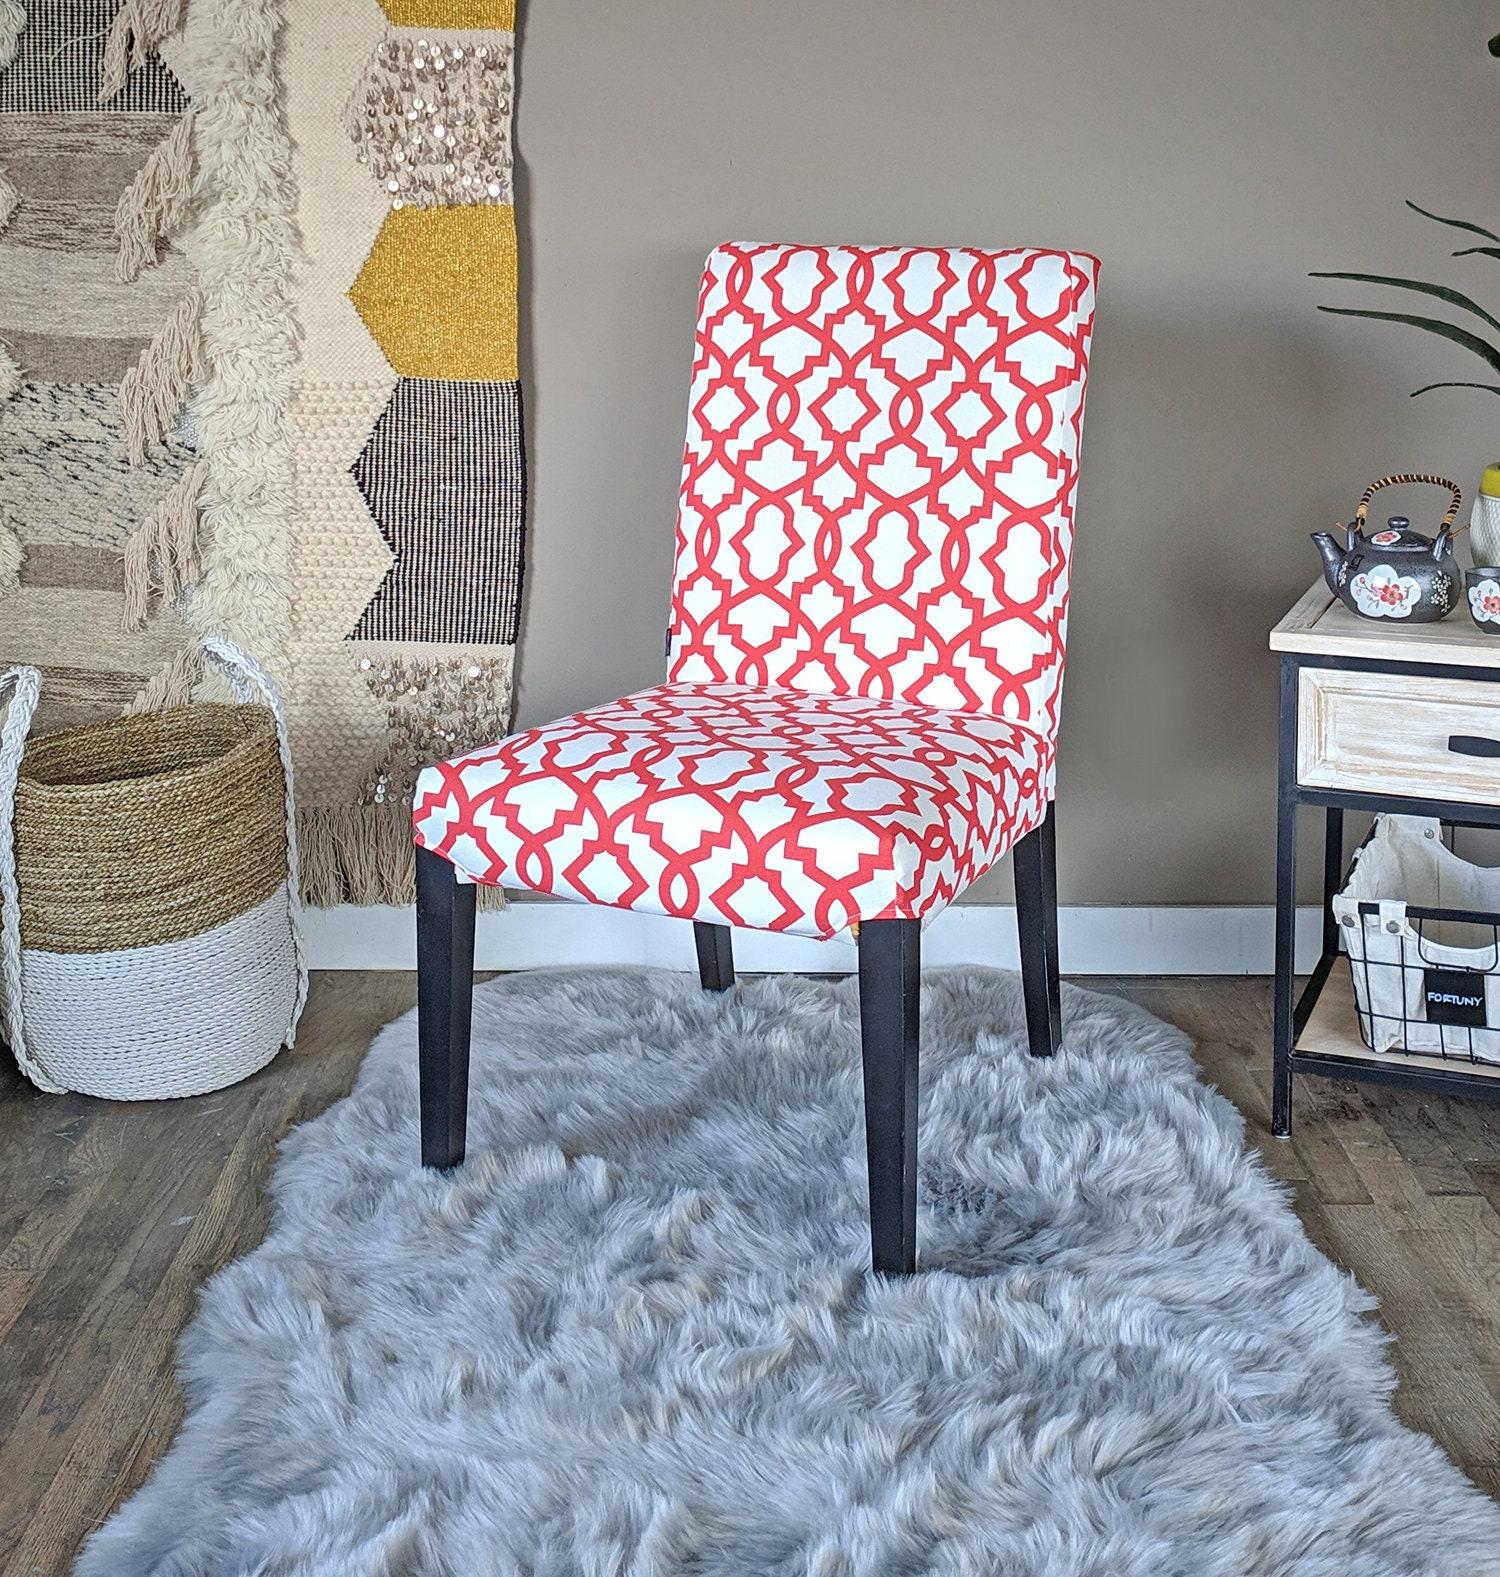 Enjoyable Sample Sale Red White Trellis Pattern Ikea Henriksdal Machost Co Dining Chair Design Ideas Machostcouk